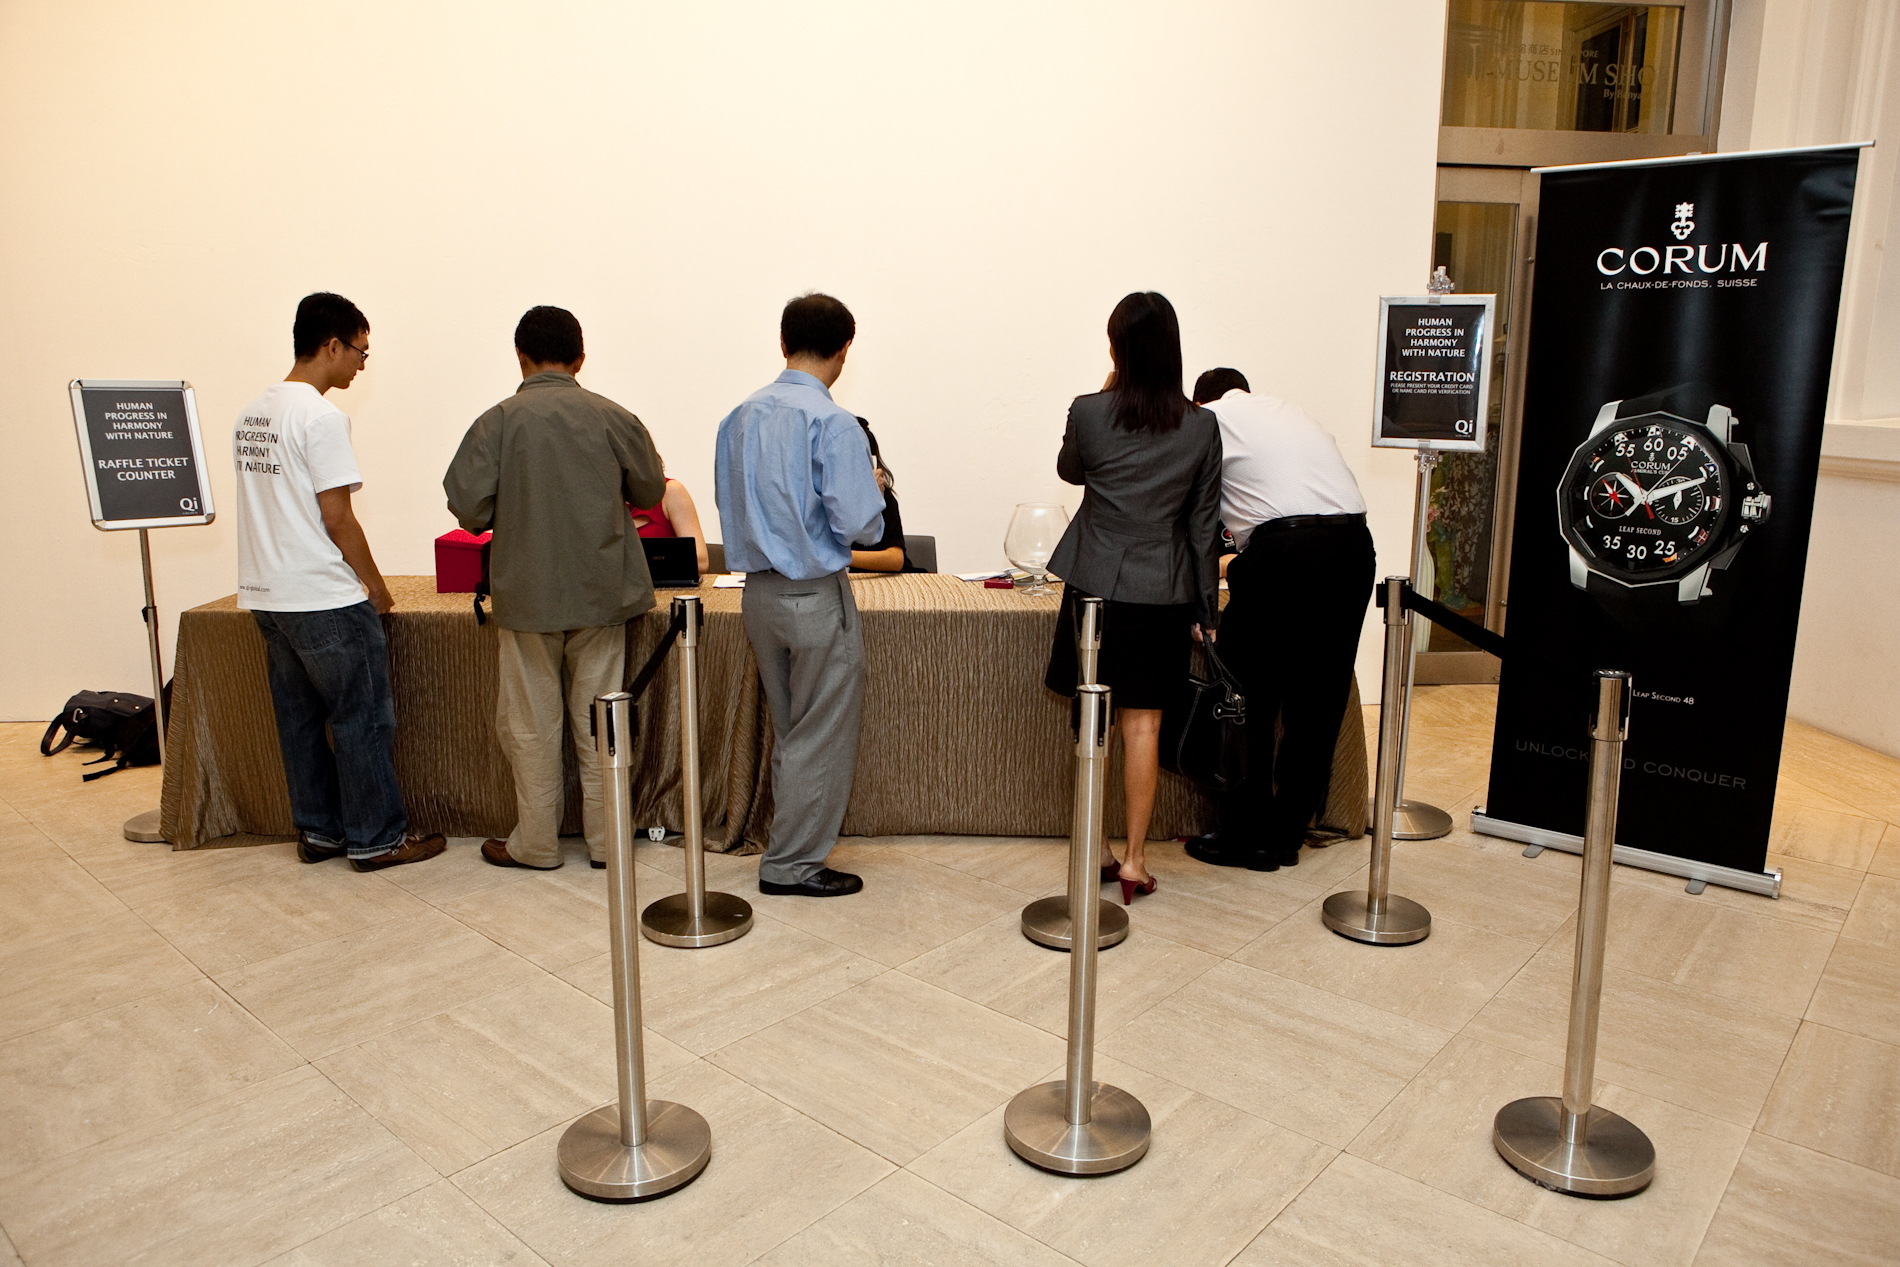 qi-global-2009-sustaible-design-singapore-061.jpg